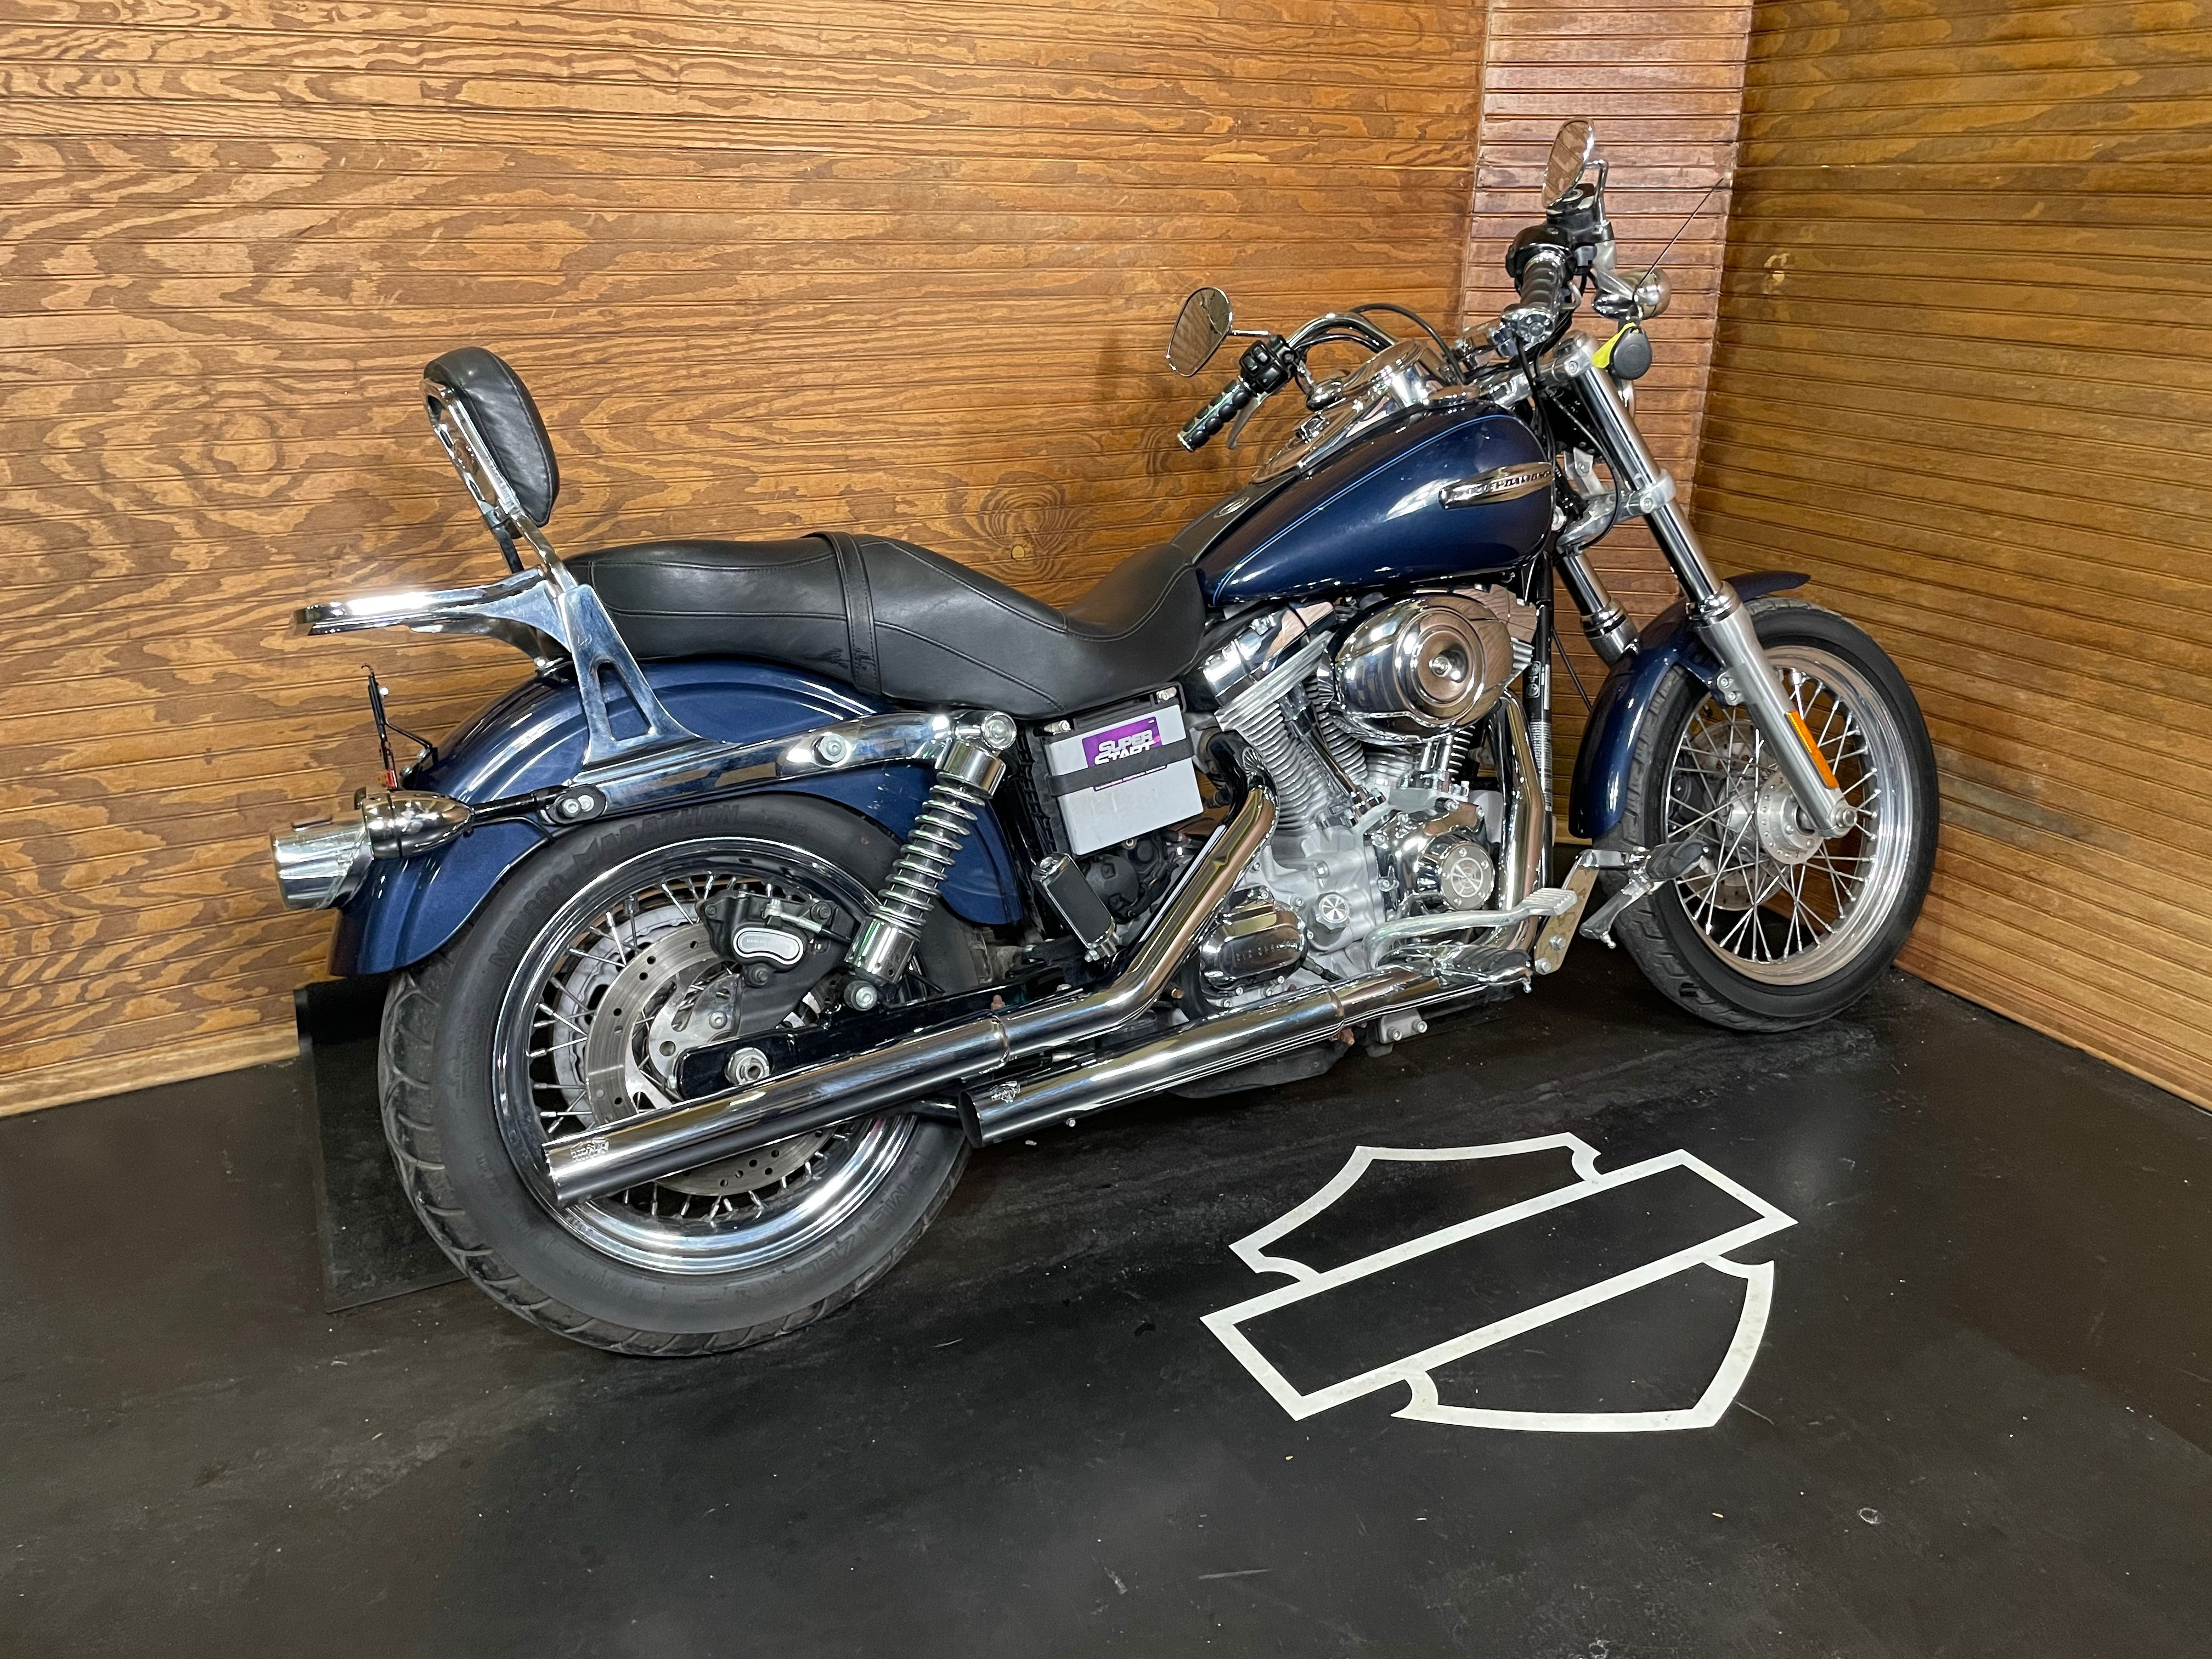 Pre-Owned 2008 Harley-Davidson Super Glide Custom